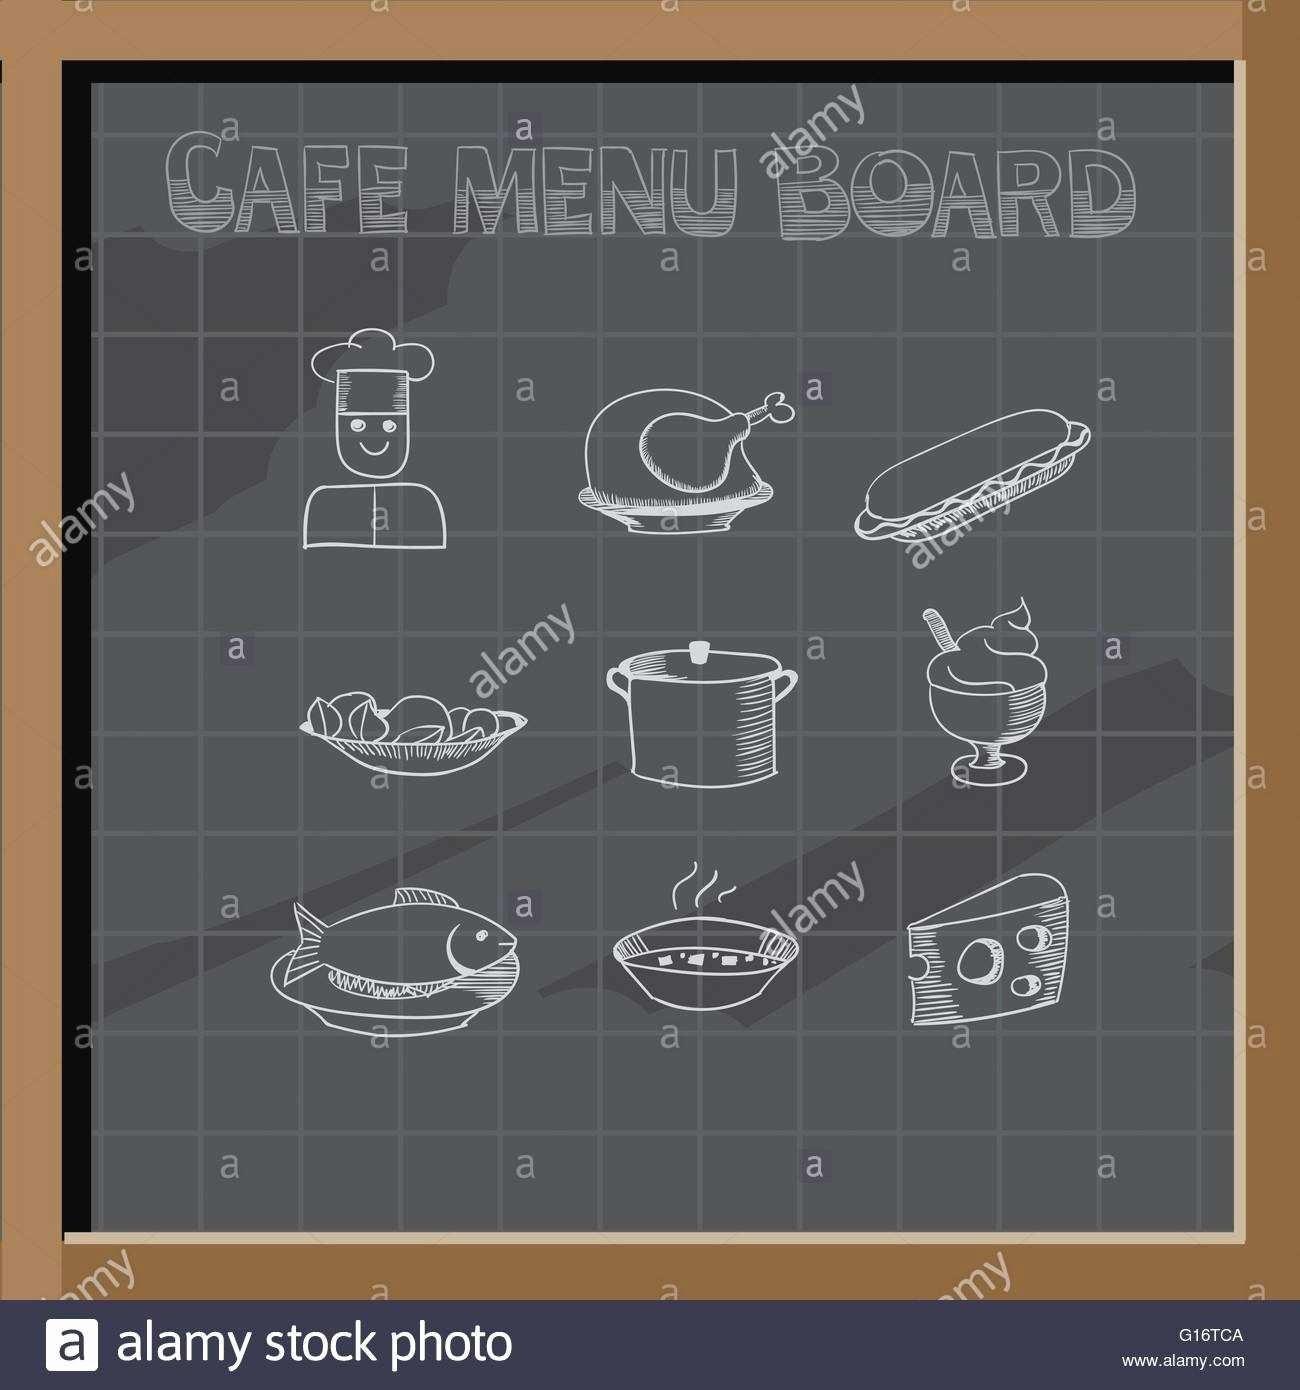 Restaurant P&l Template Fresh Digital Menu Board Design Templates Inspirational Chalk